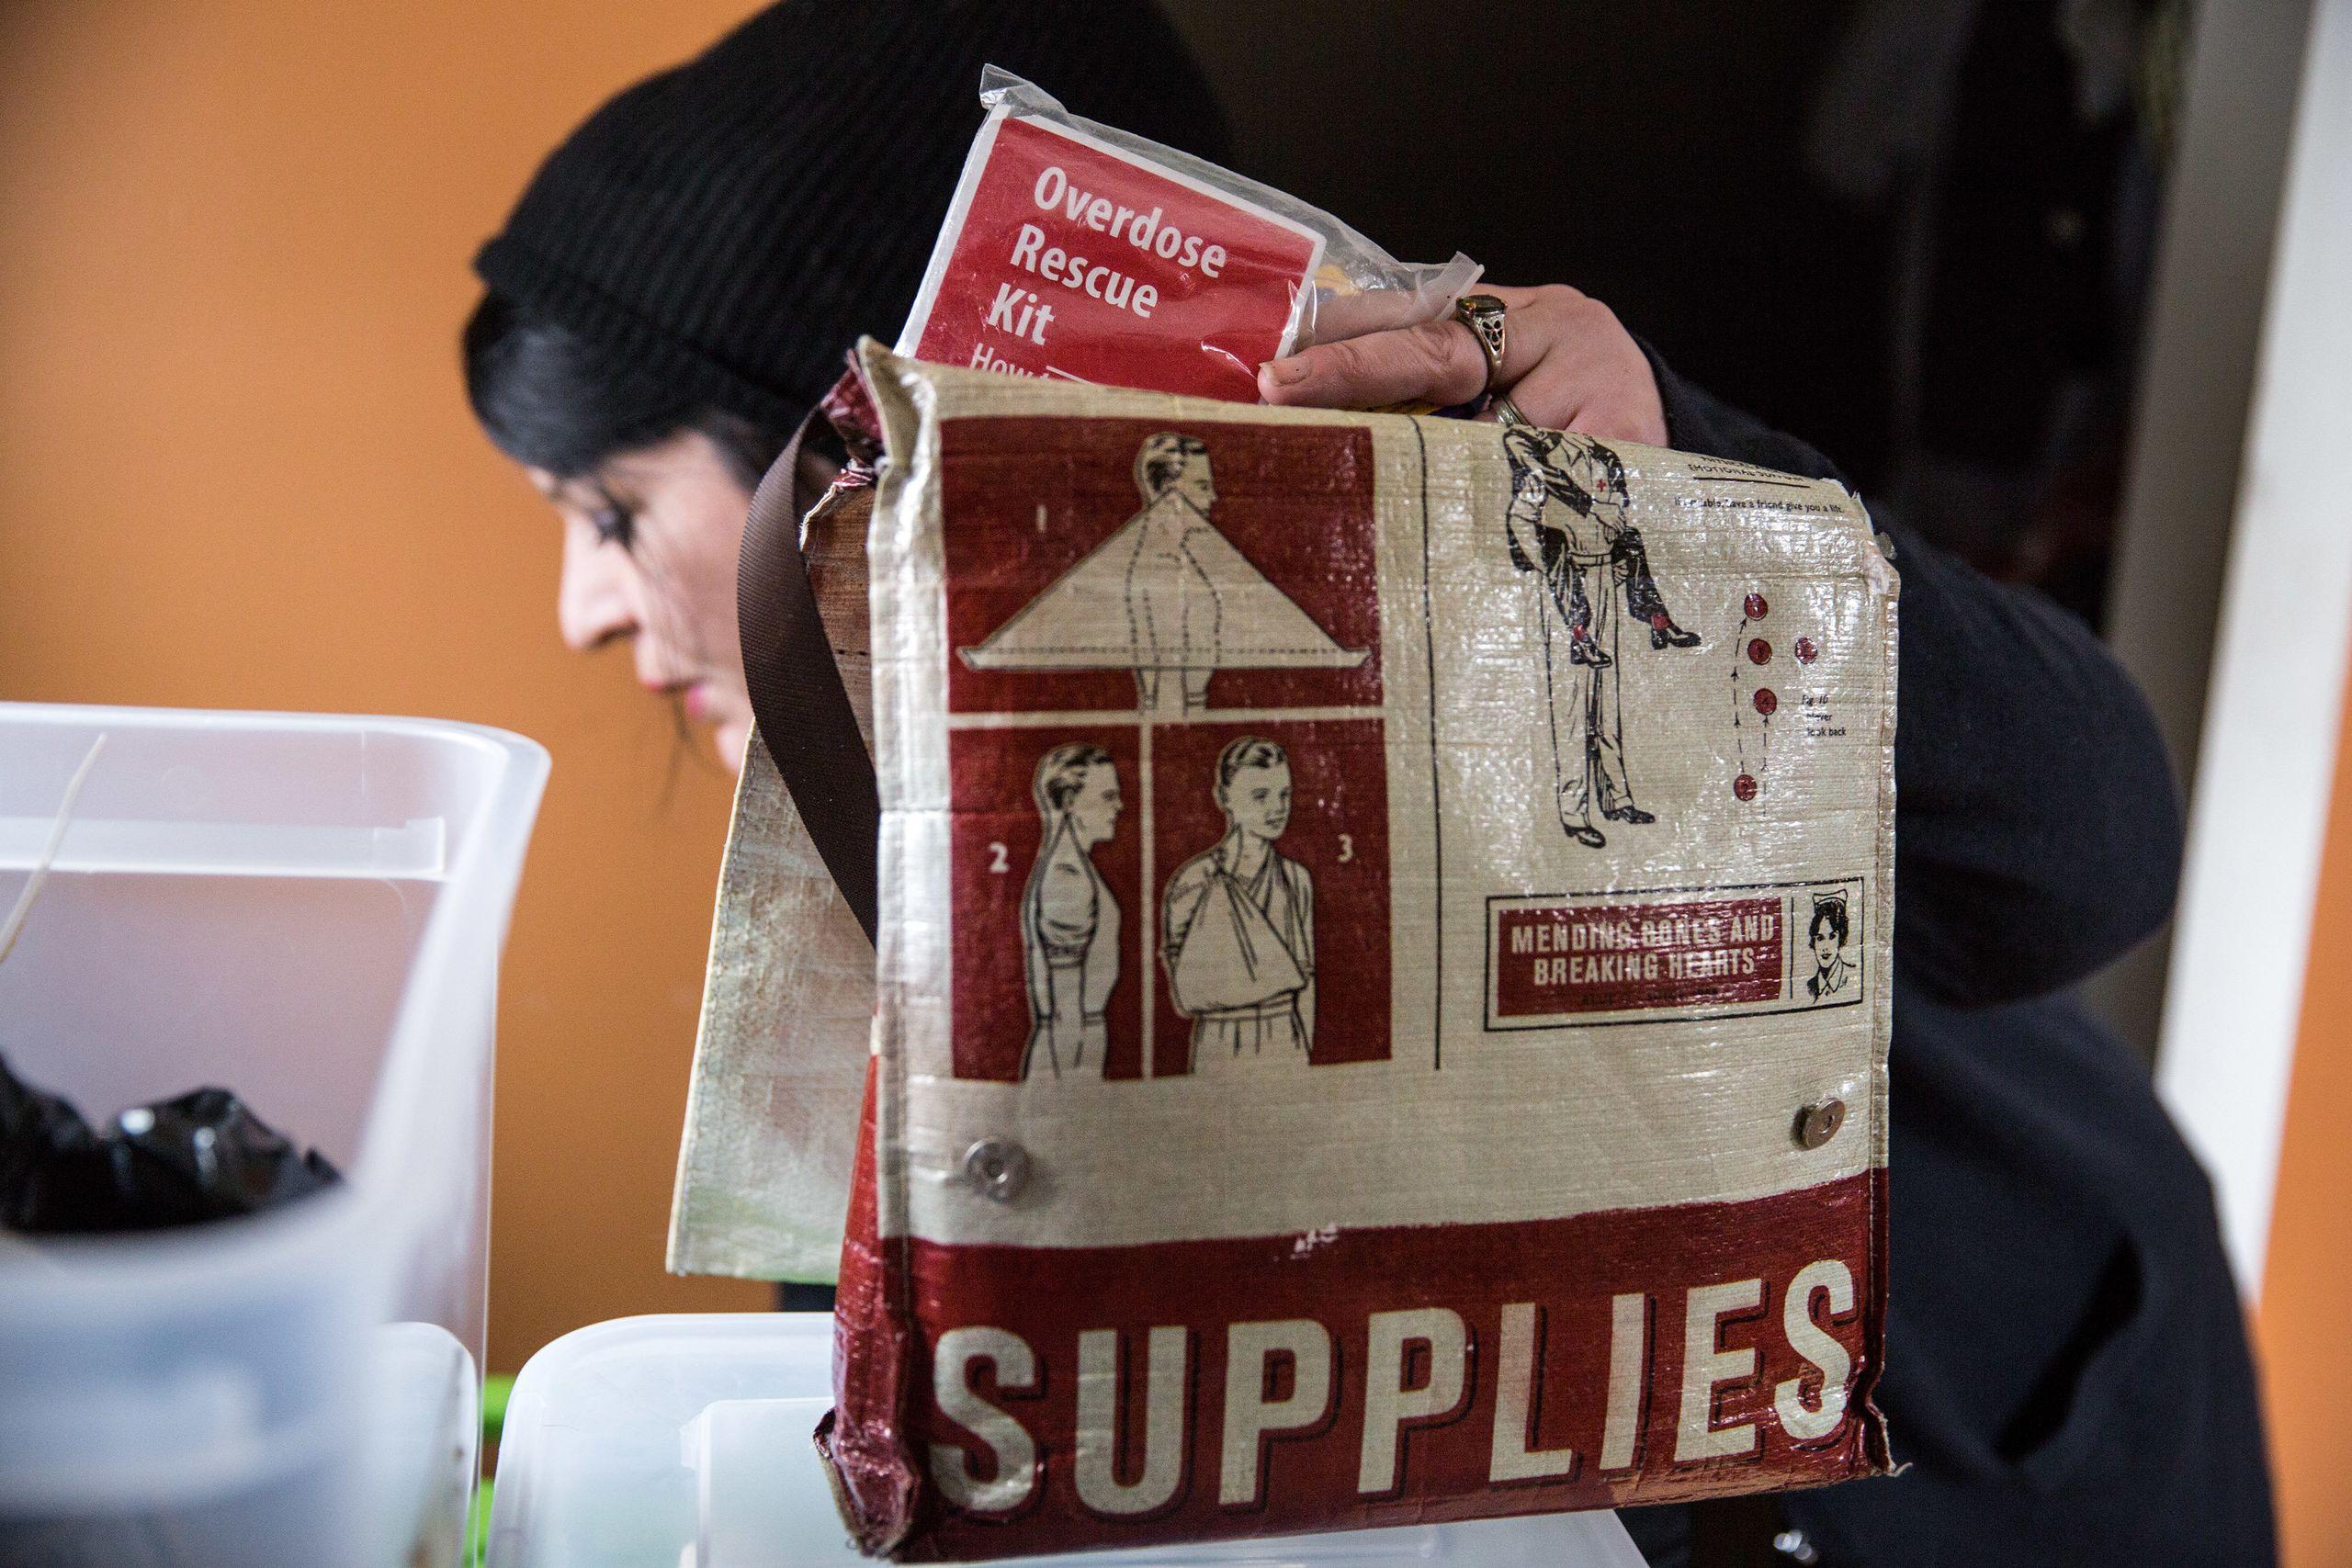 Tilley puts together a bag of safer injection supplies.